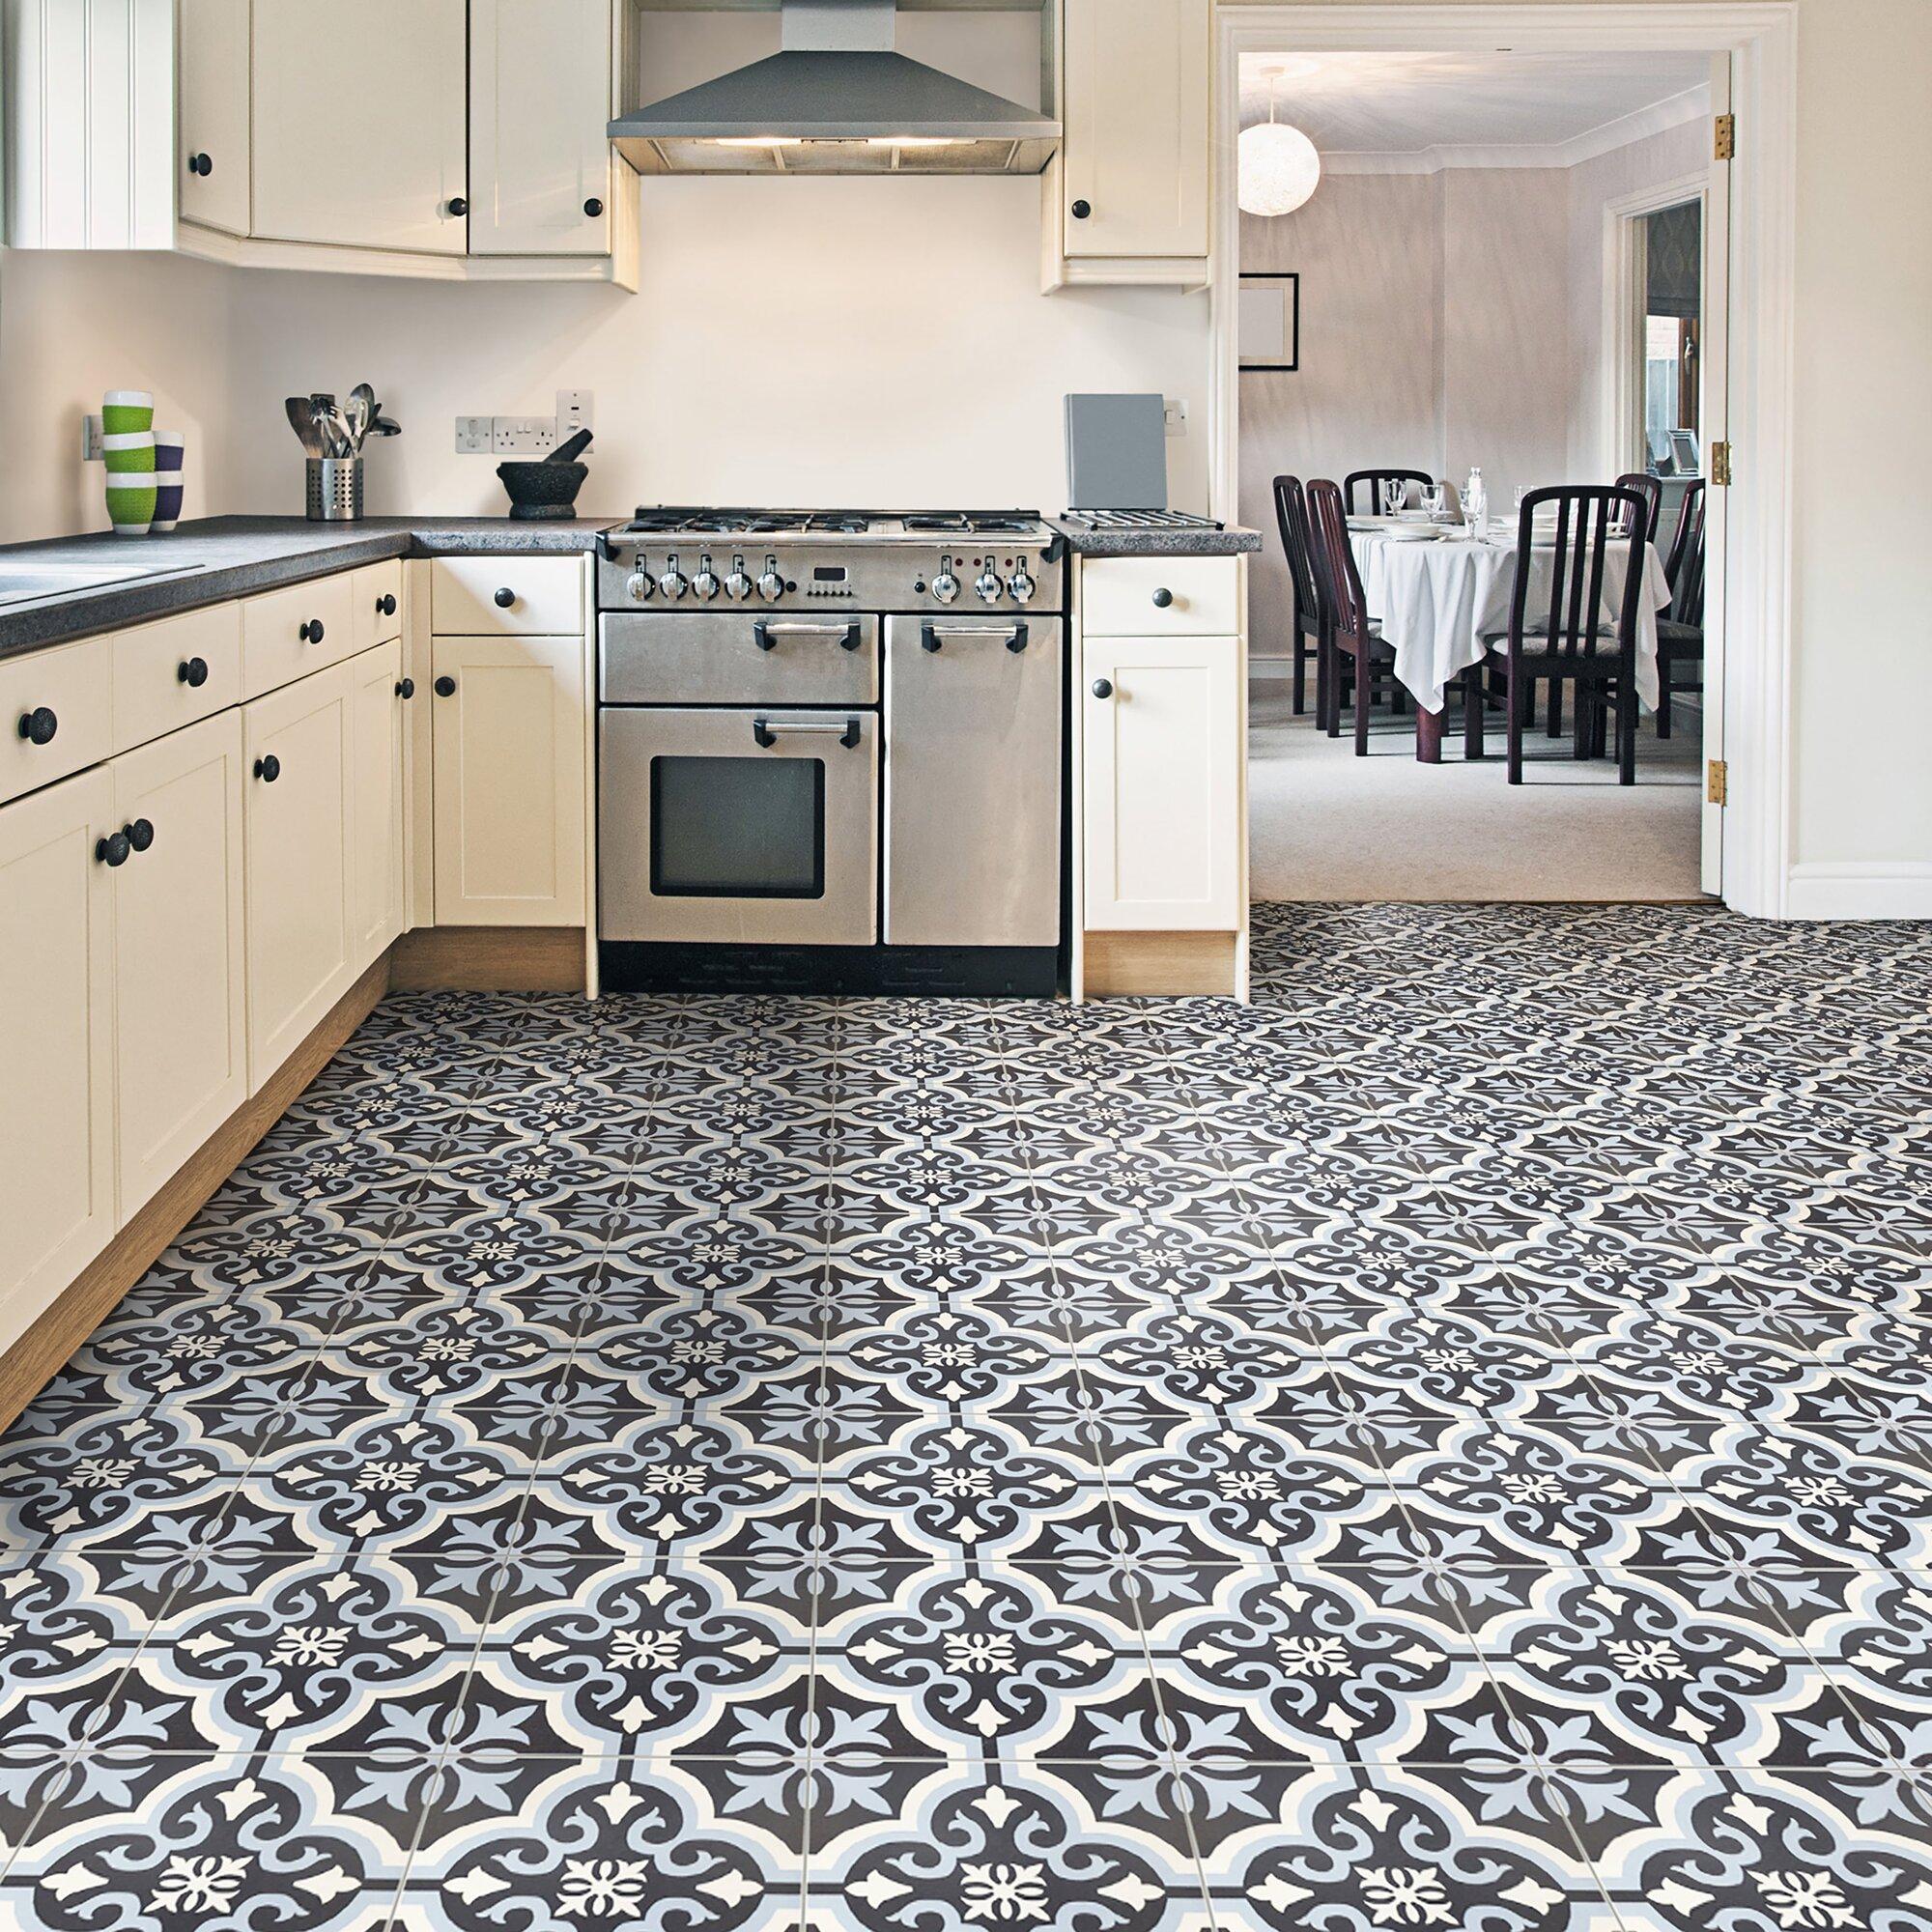 Lima ceramic tile picture of tiles design ideas dailygadgetfo Choice Image